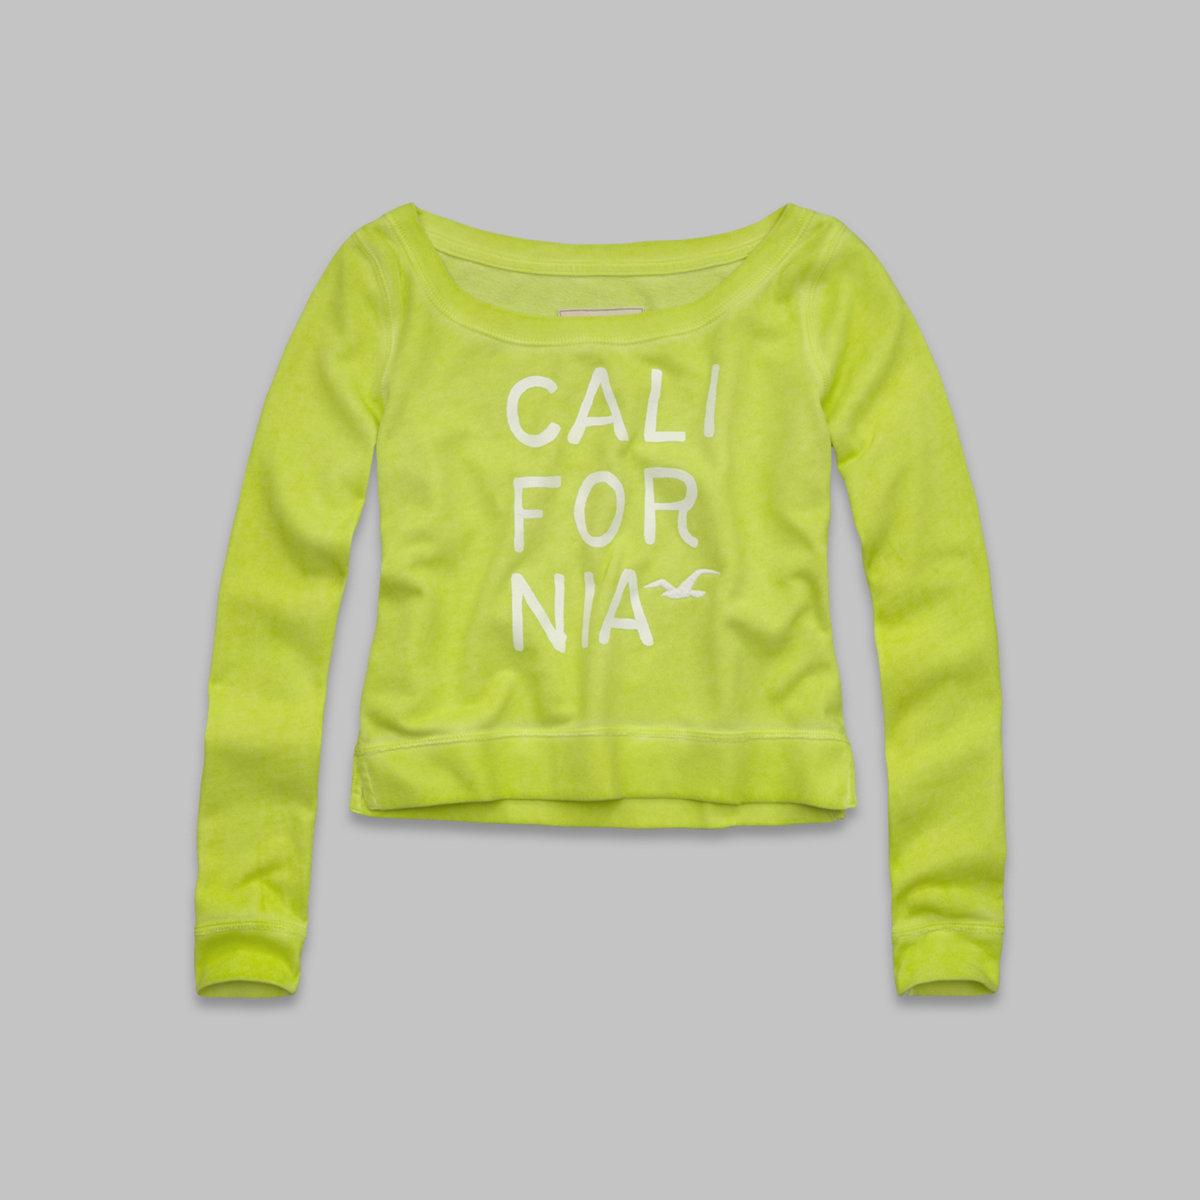 Solana Beach Sweatshirt